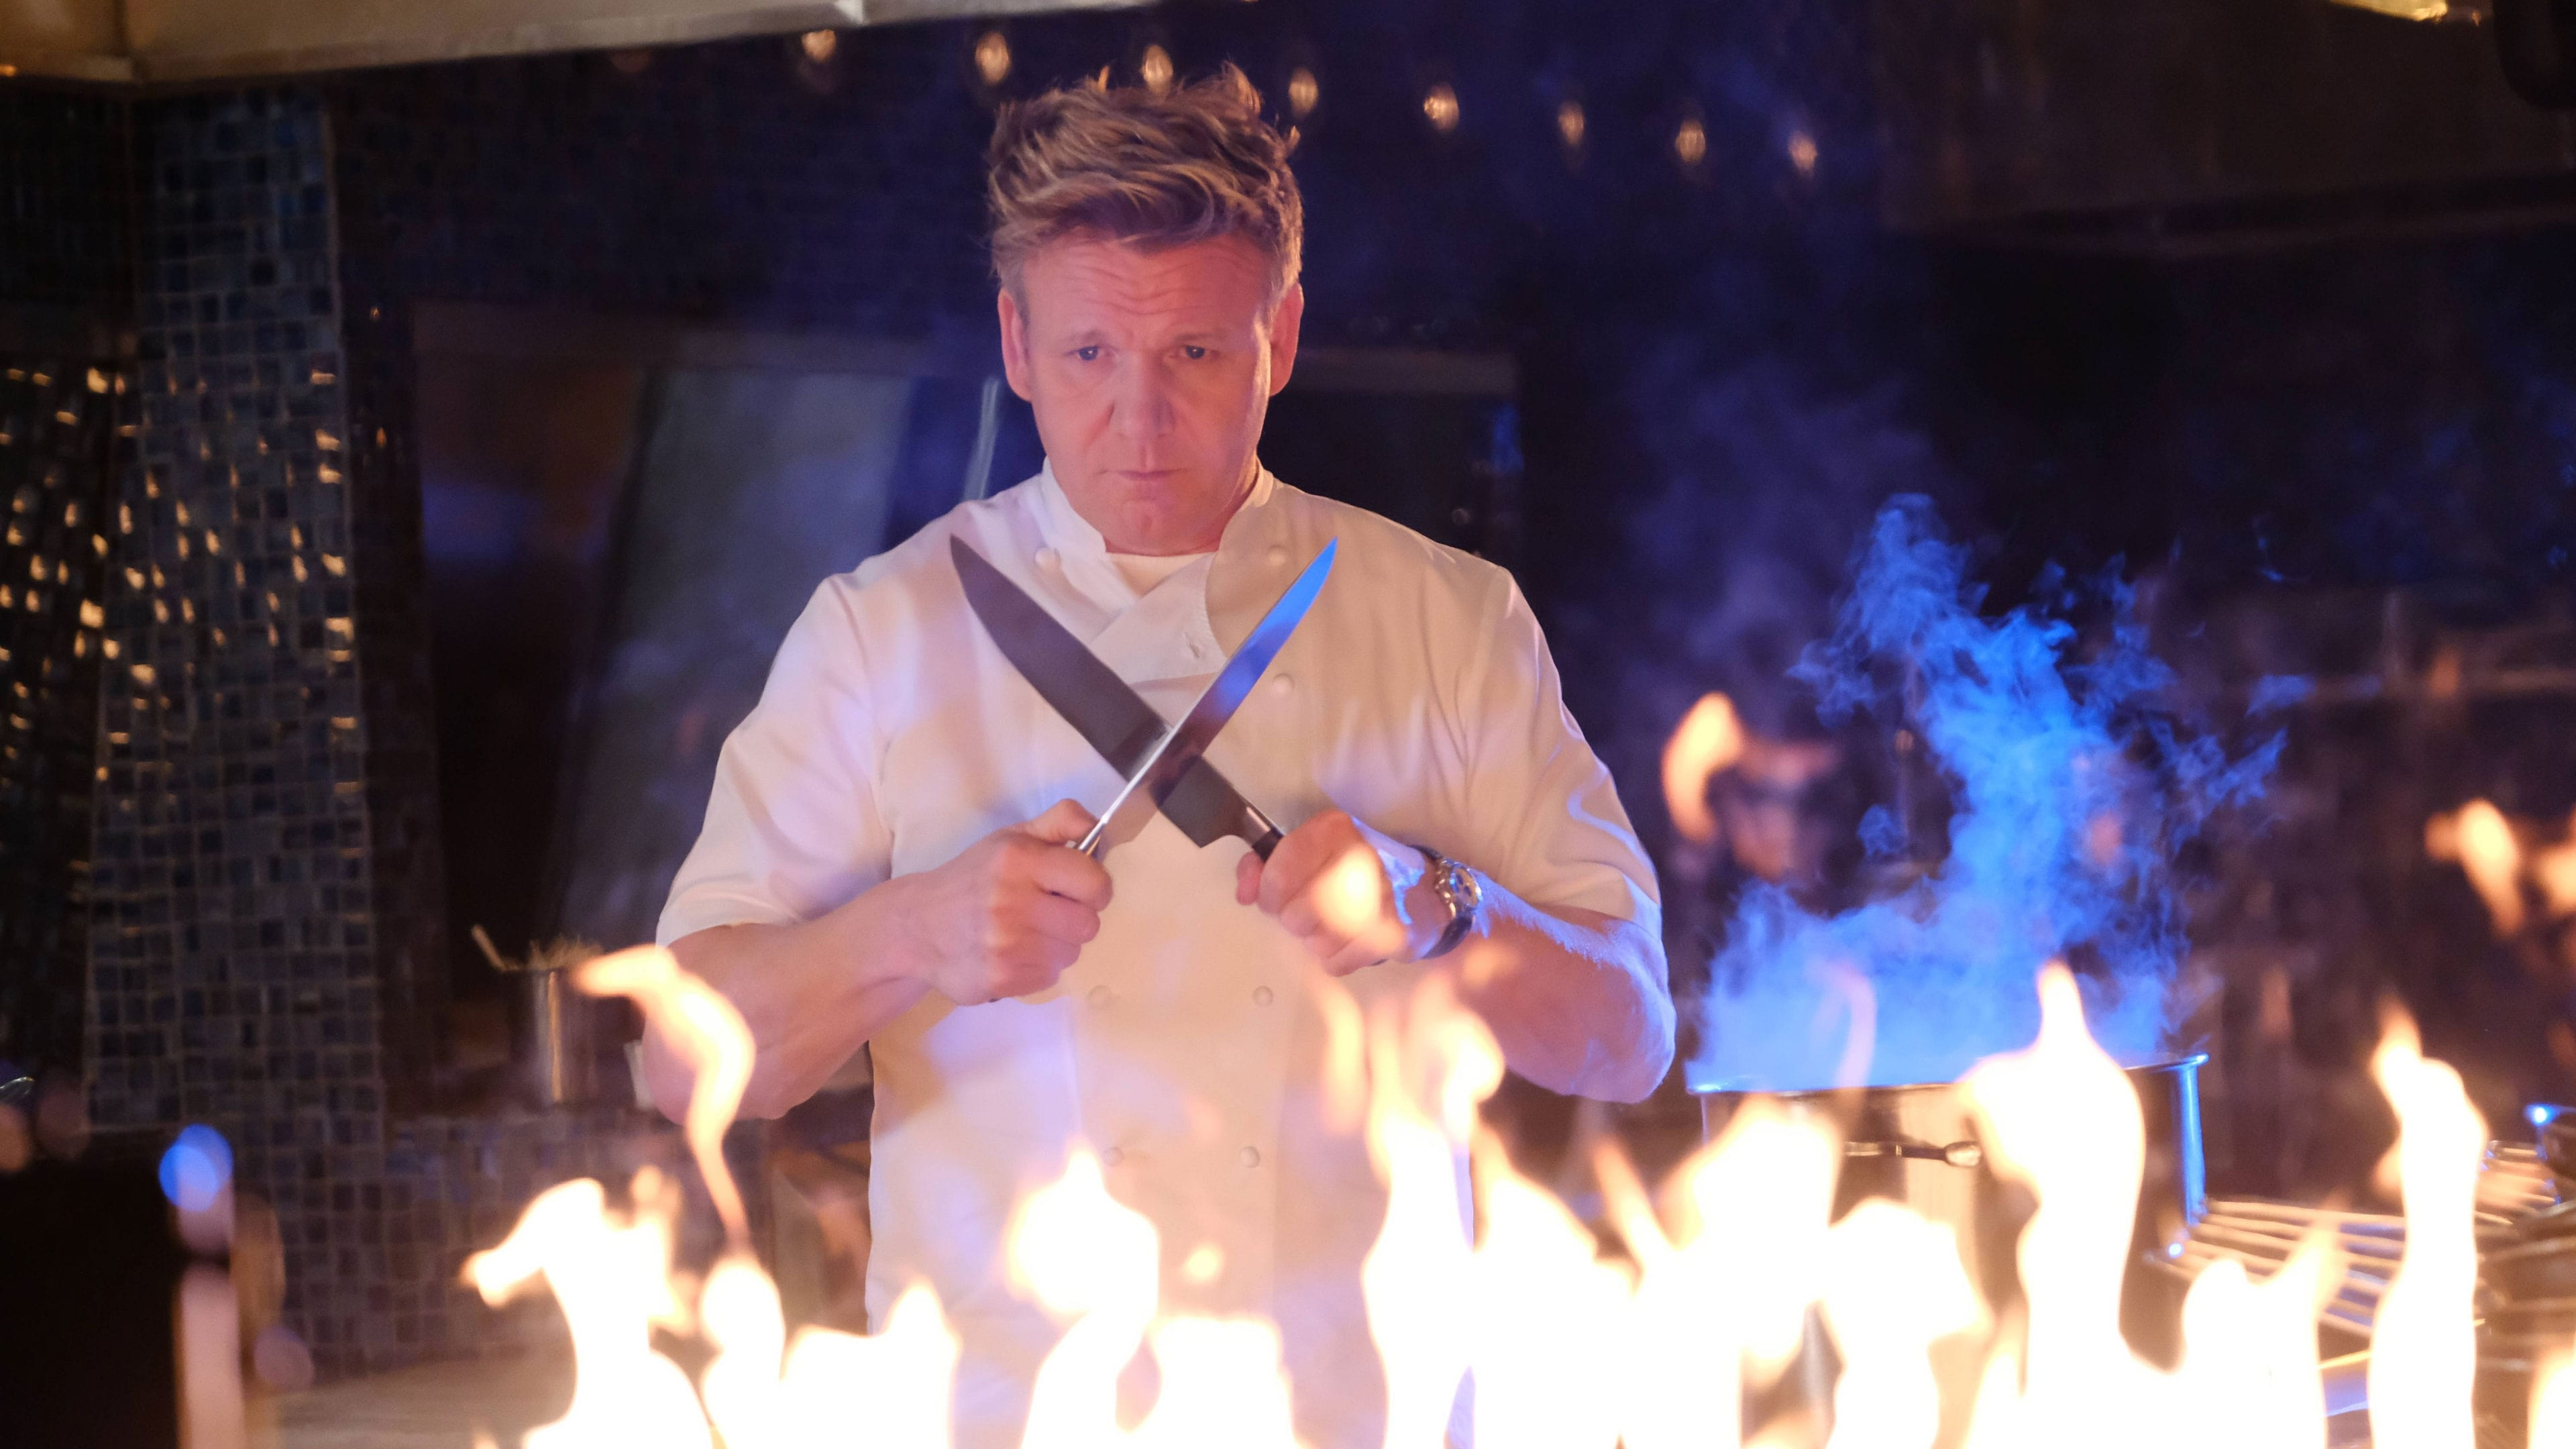 Hell S Kitchen Season 18 X Episode 9 Free To Watch Online